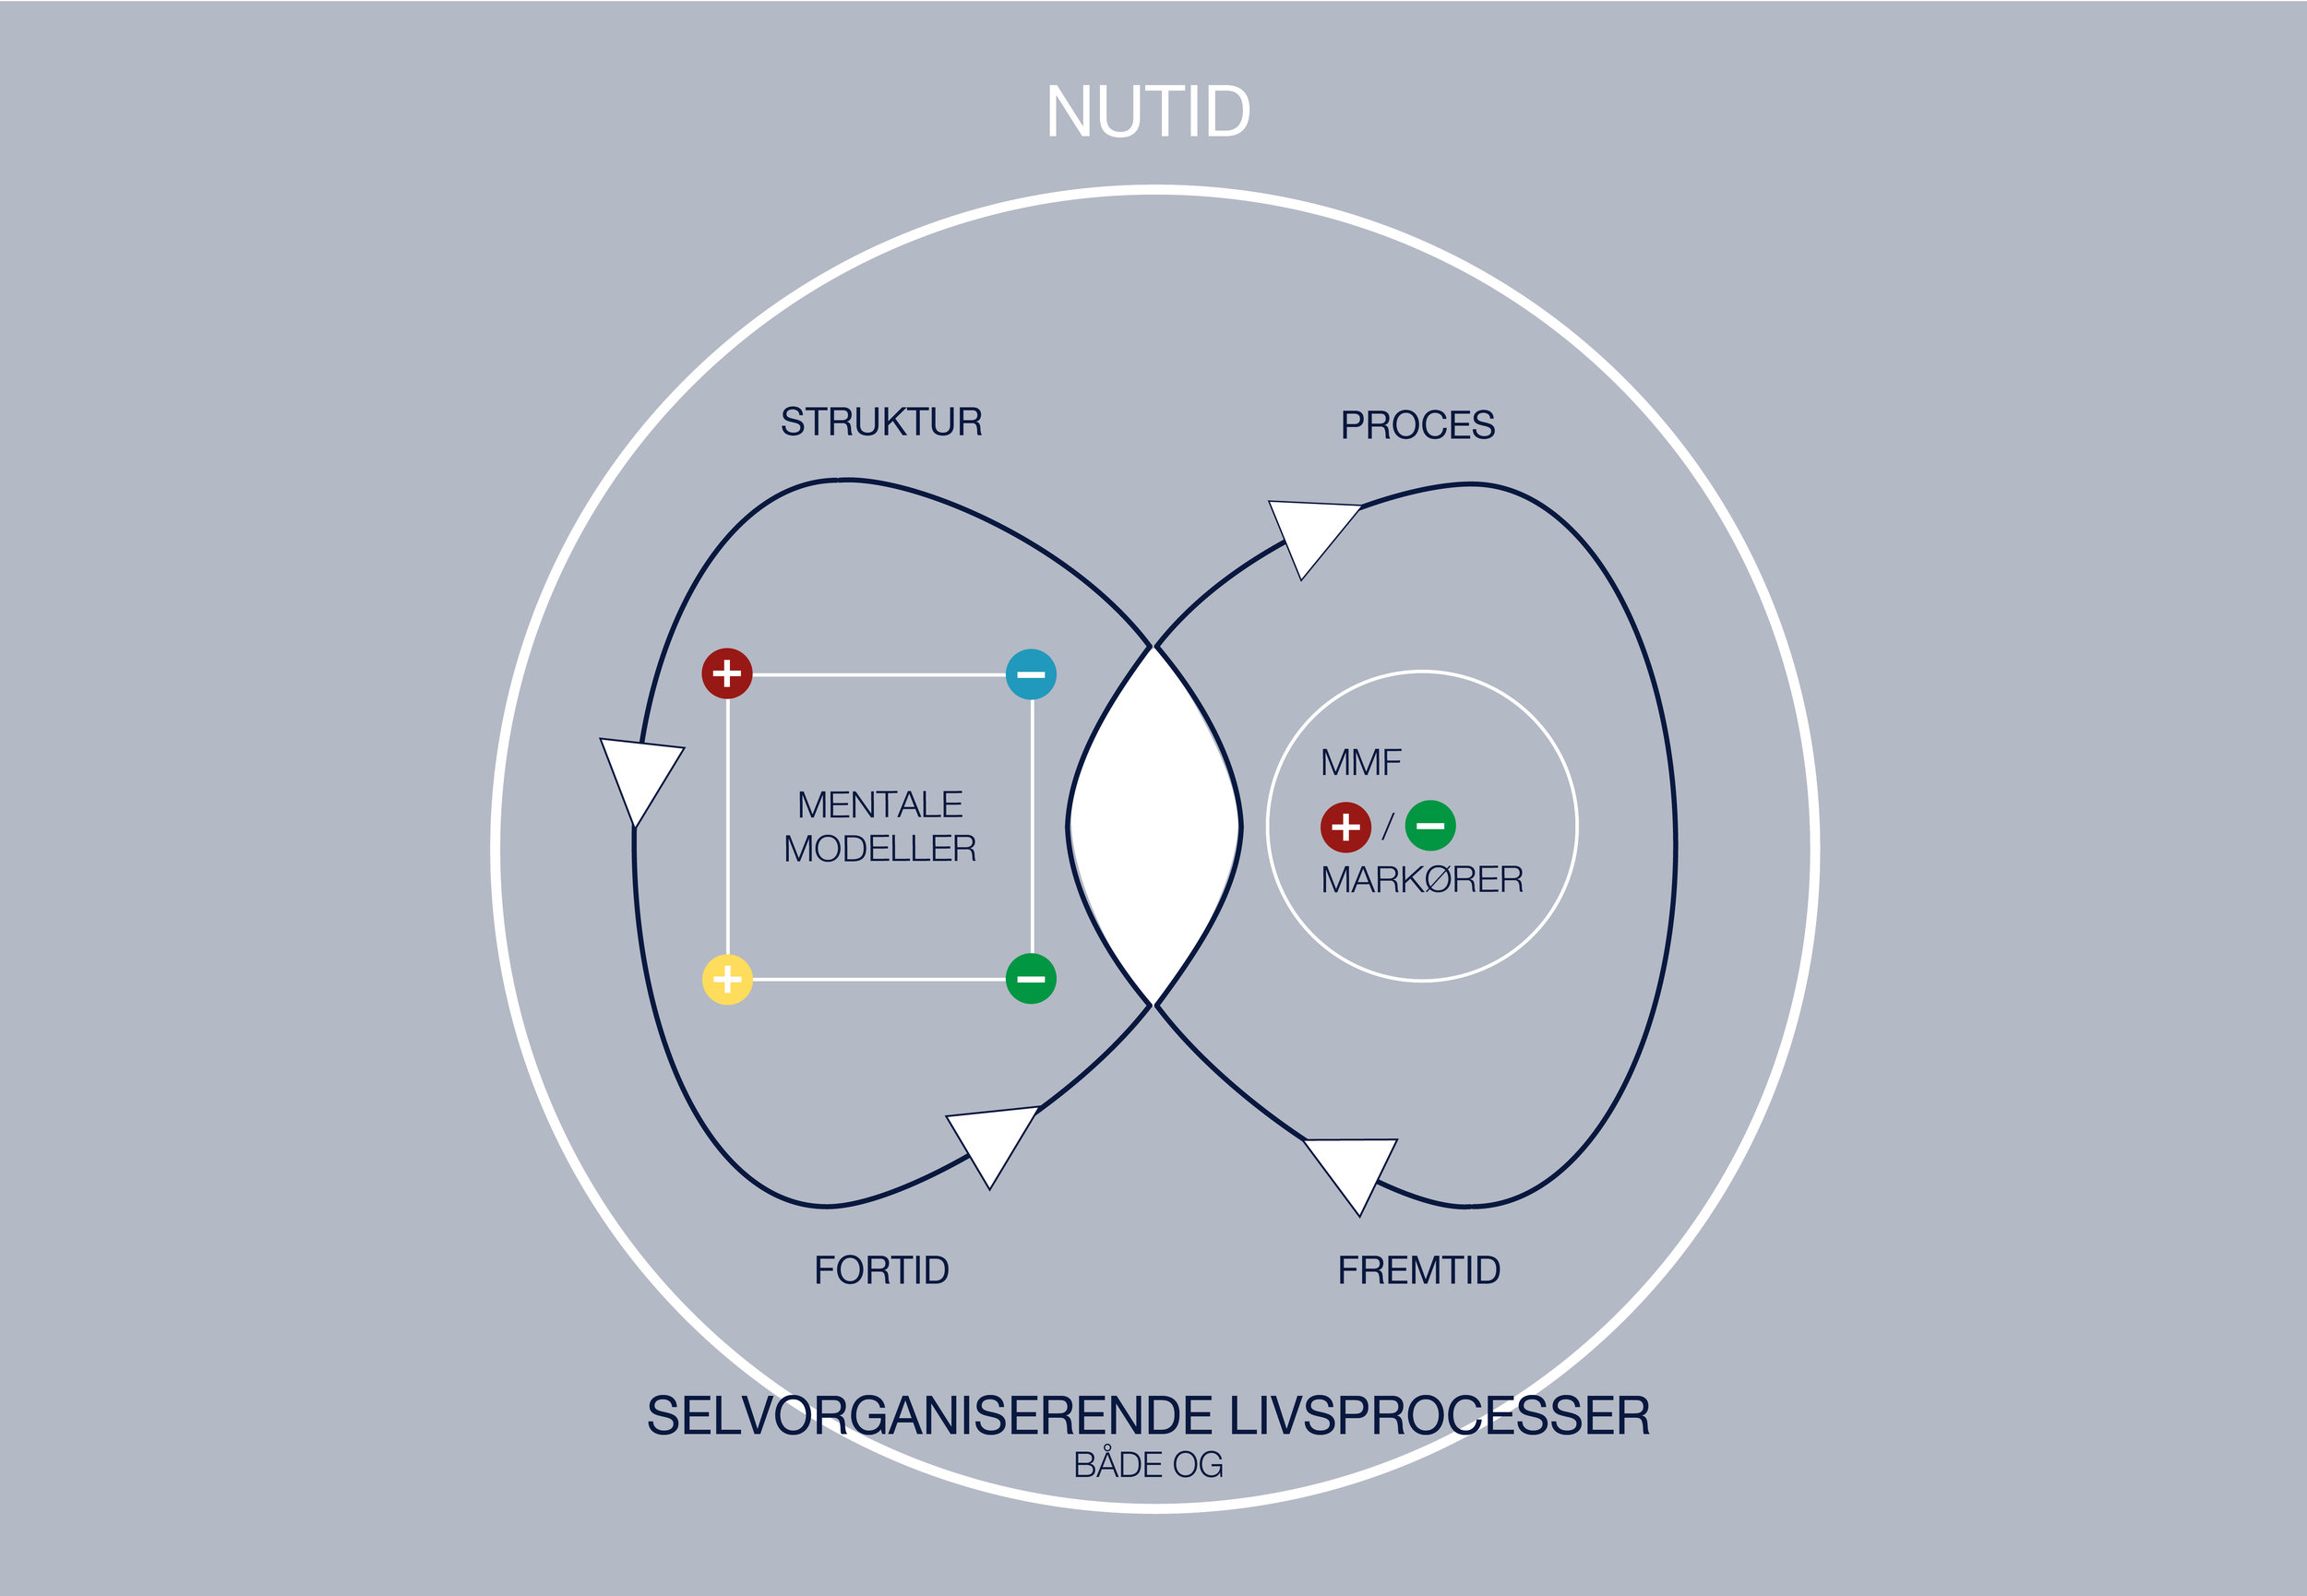 NUTID_MMF